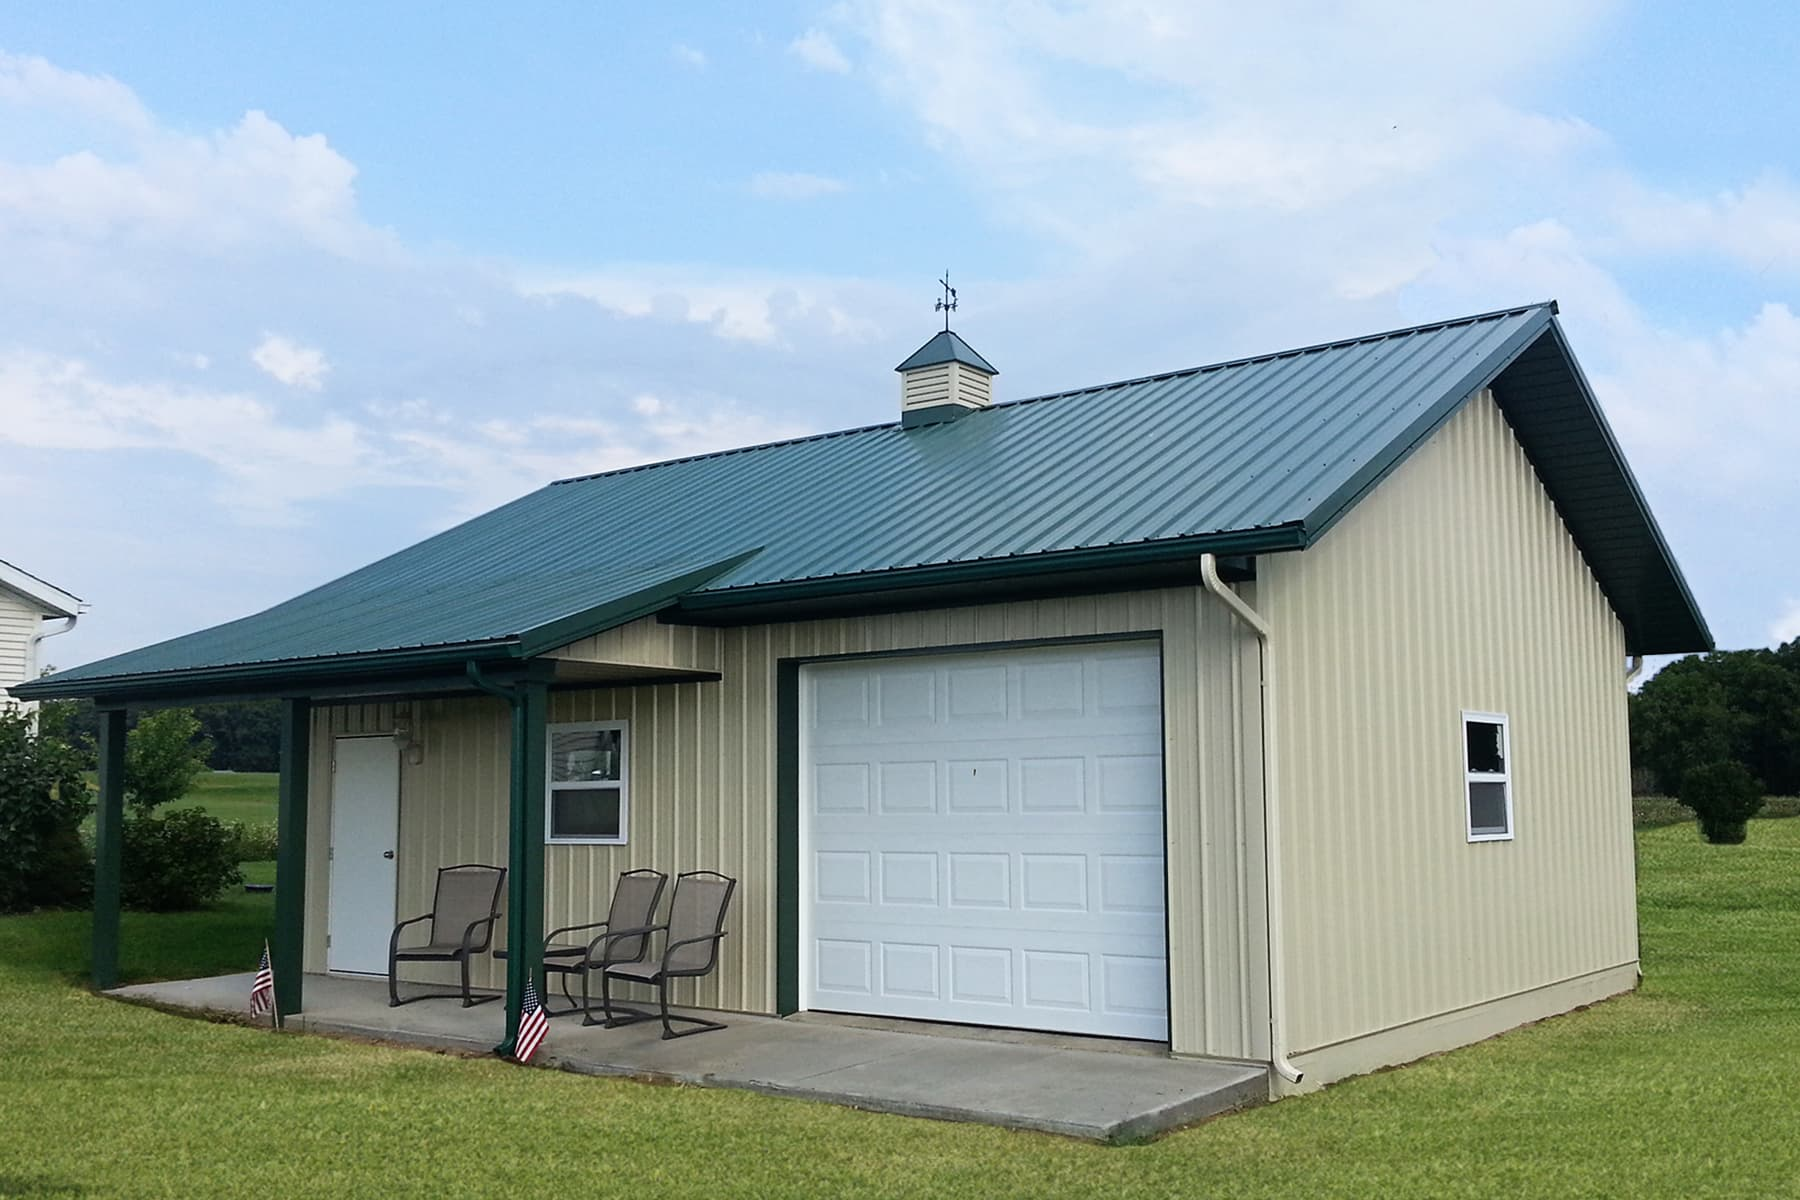 Small Garage General Contractor